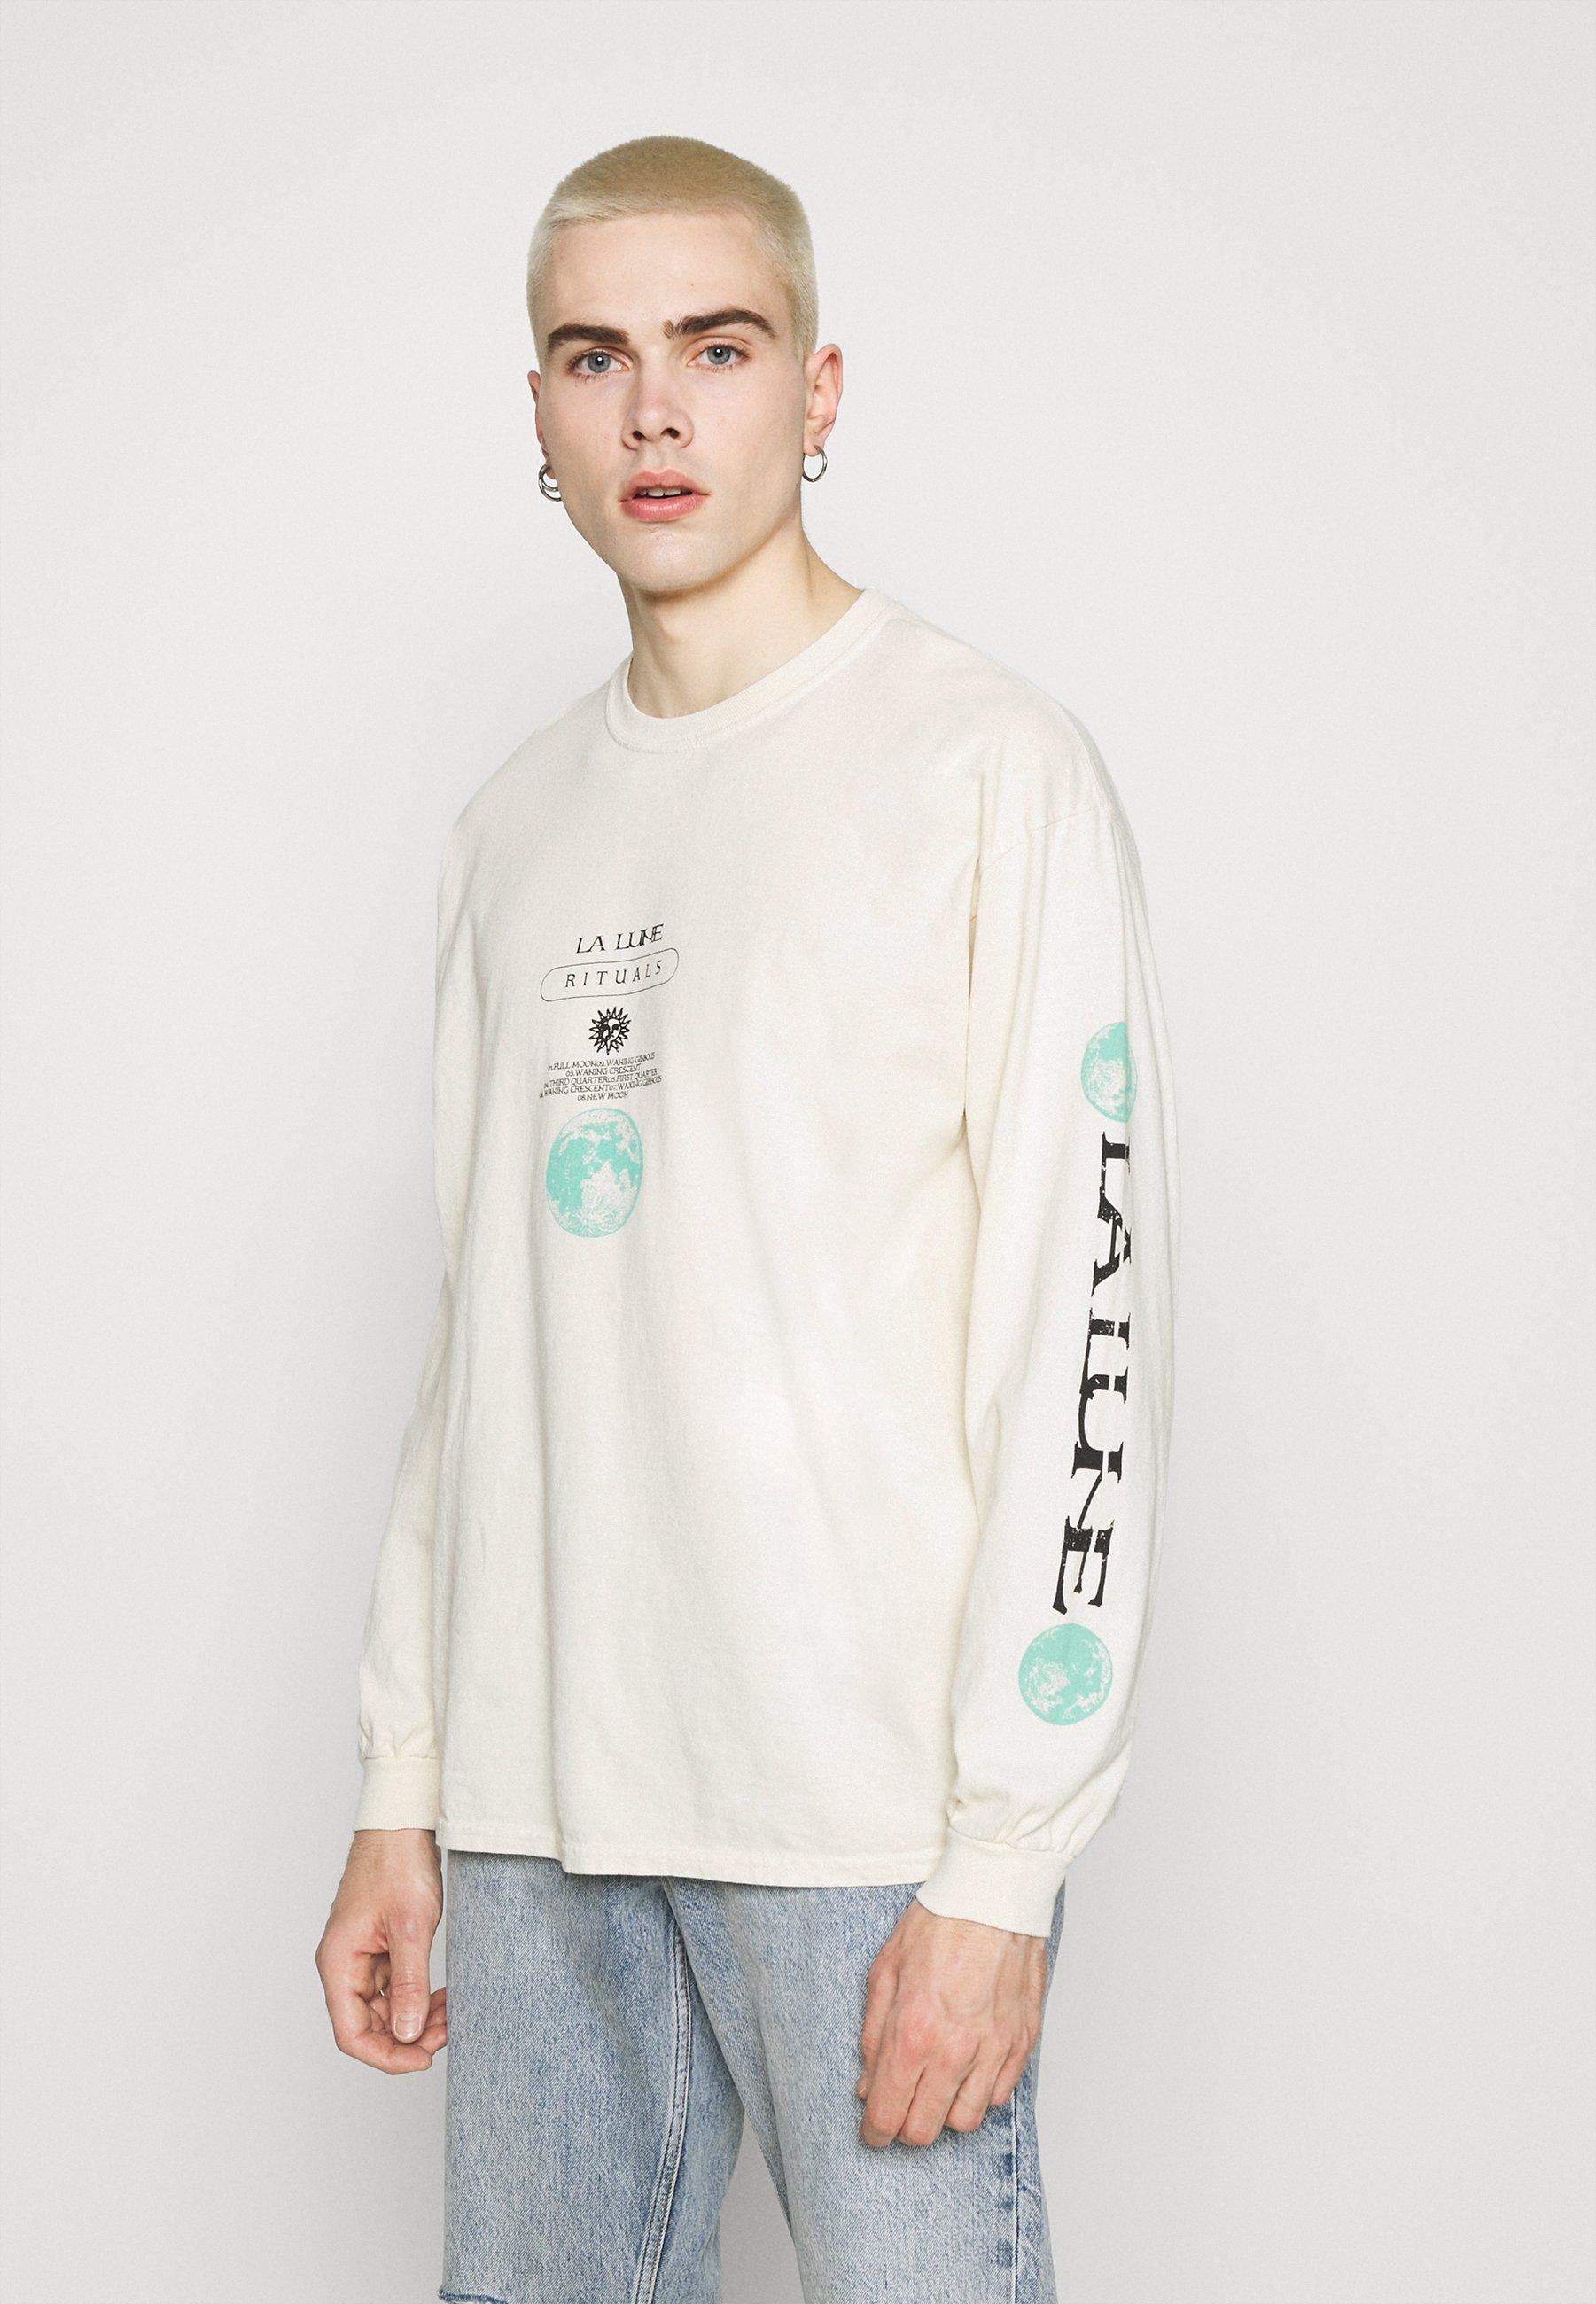 Uomo UNISEX LUNA SKATE TEE - Maglietta a manica lunga